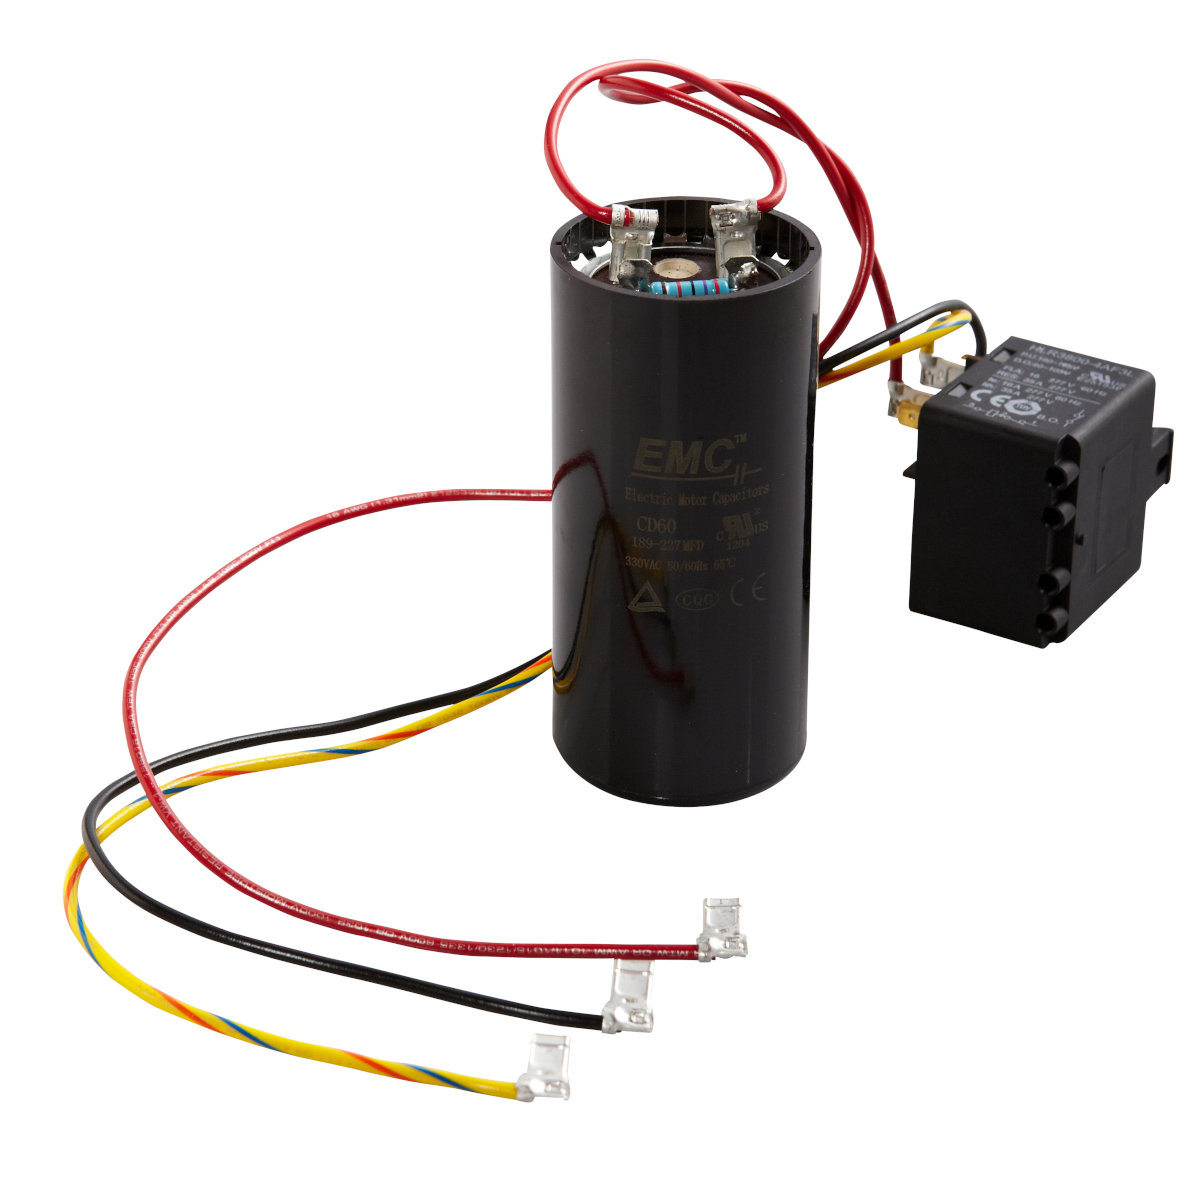 5-2-1 Compressor Saver (Hard Start Kit) for A/C Technicians on